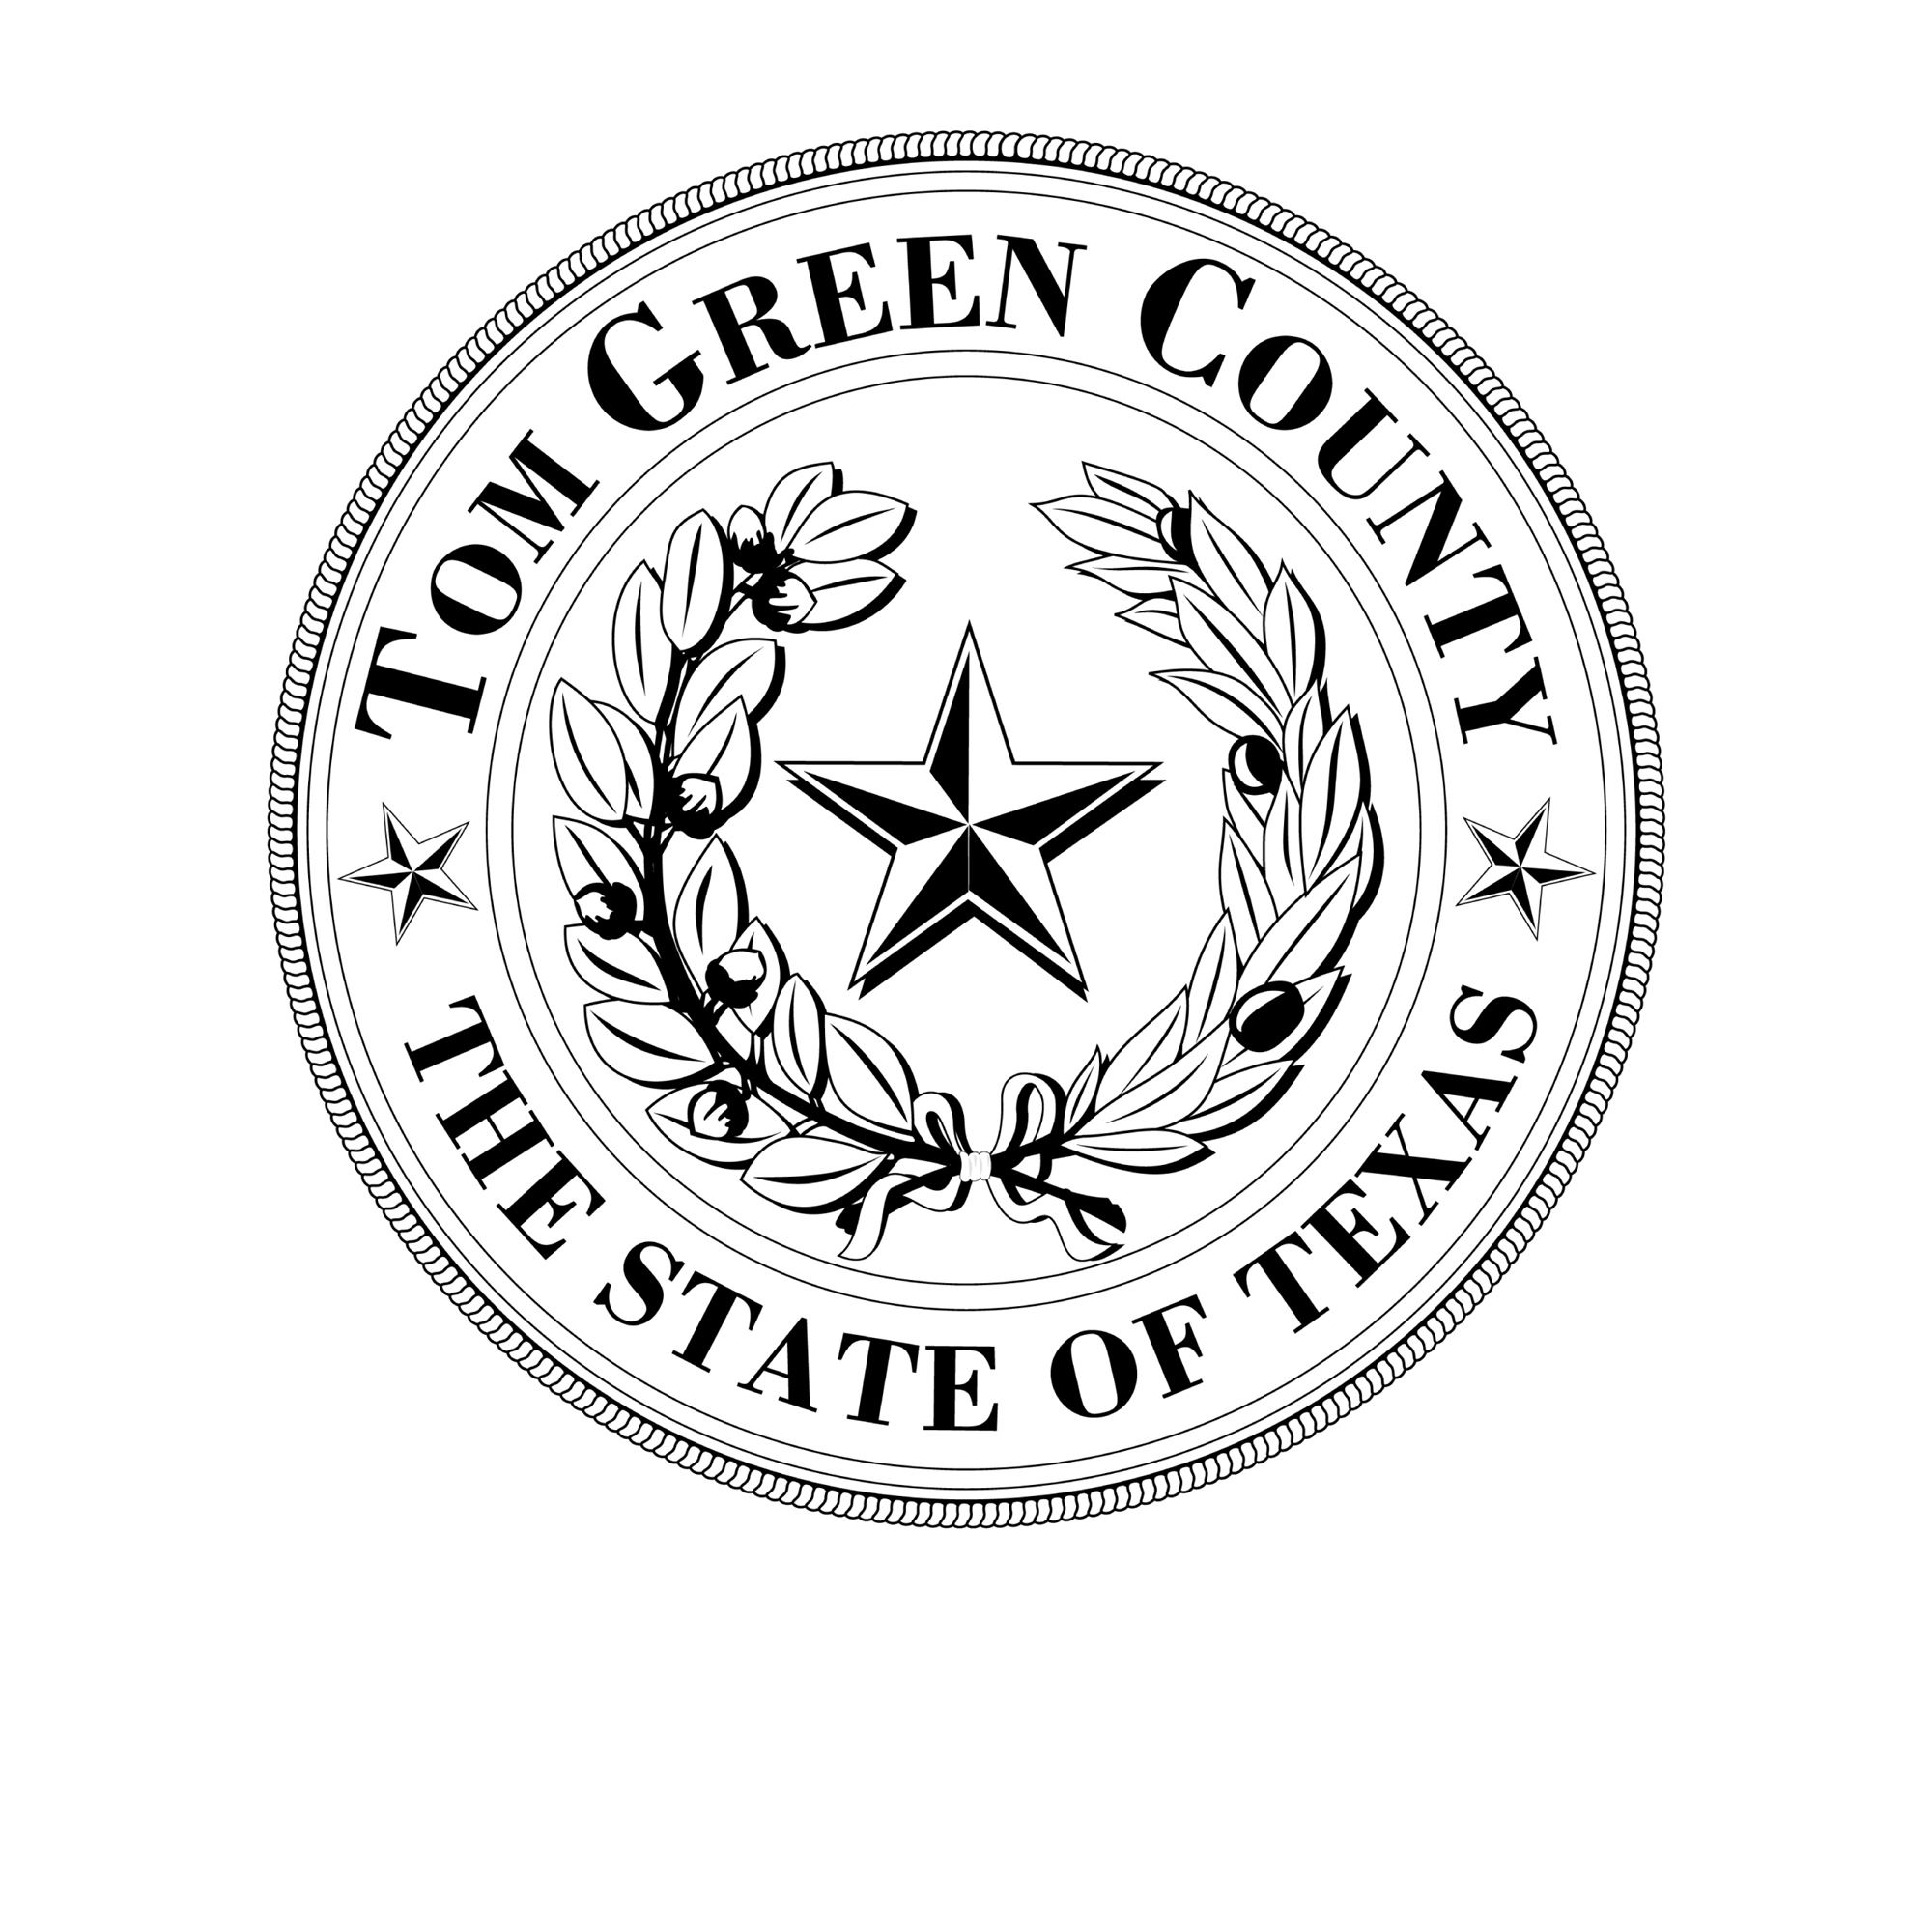 Tom Green County, TX